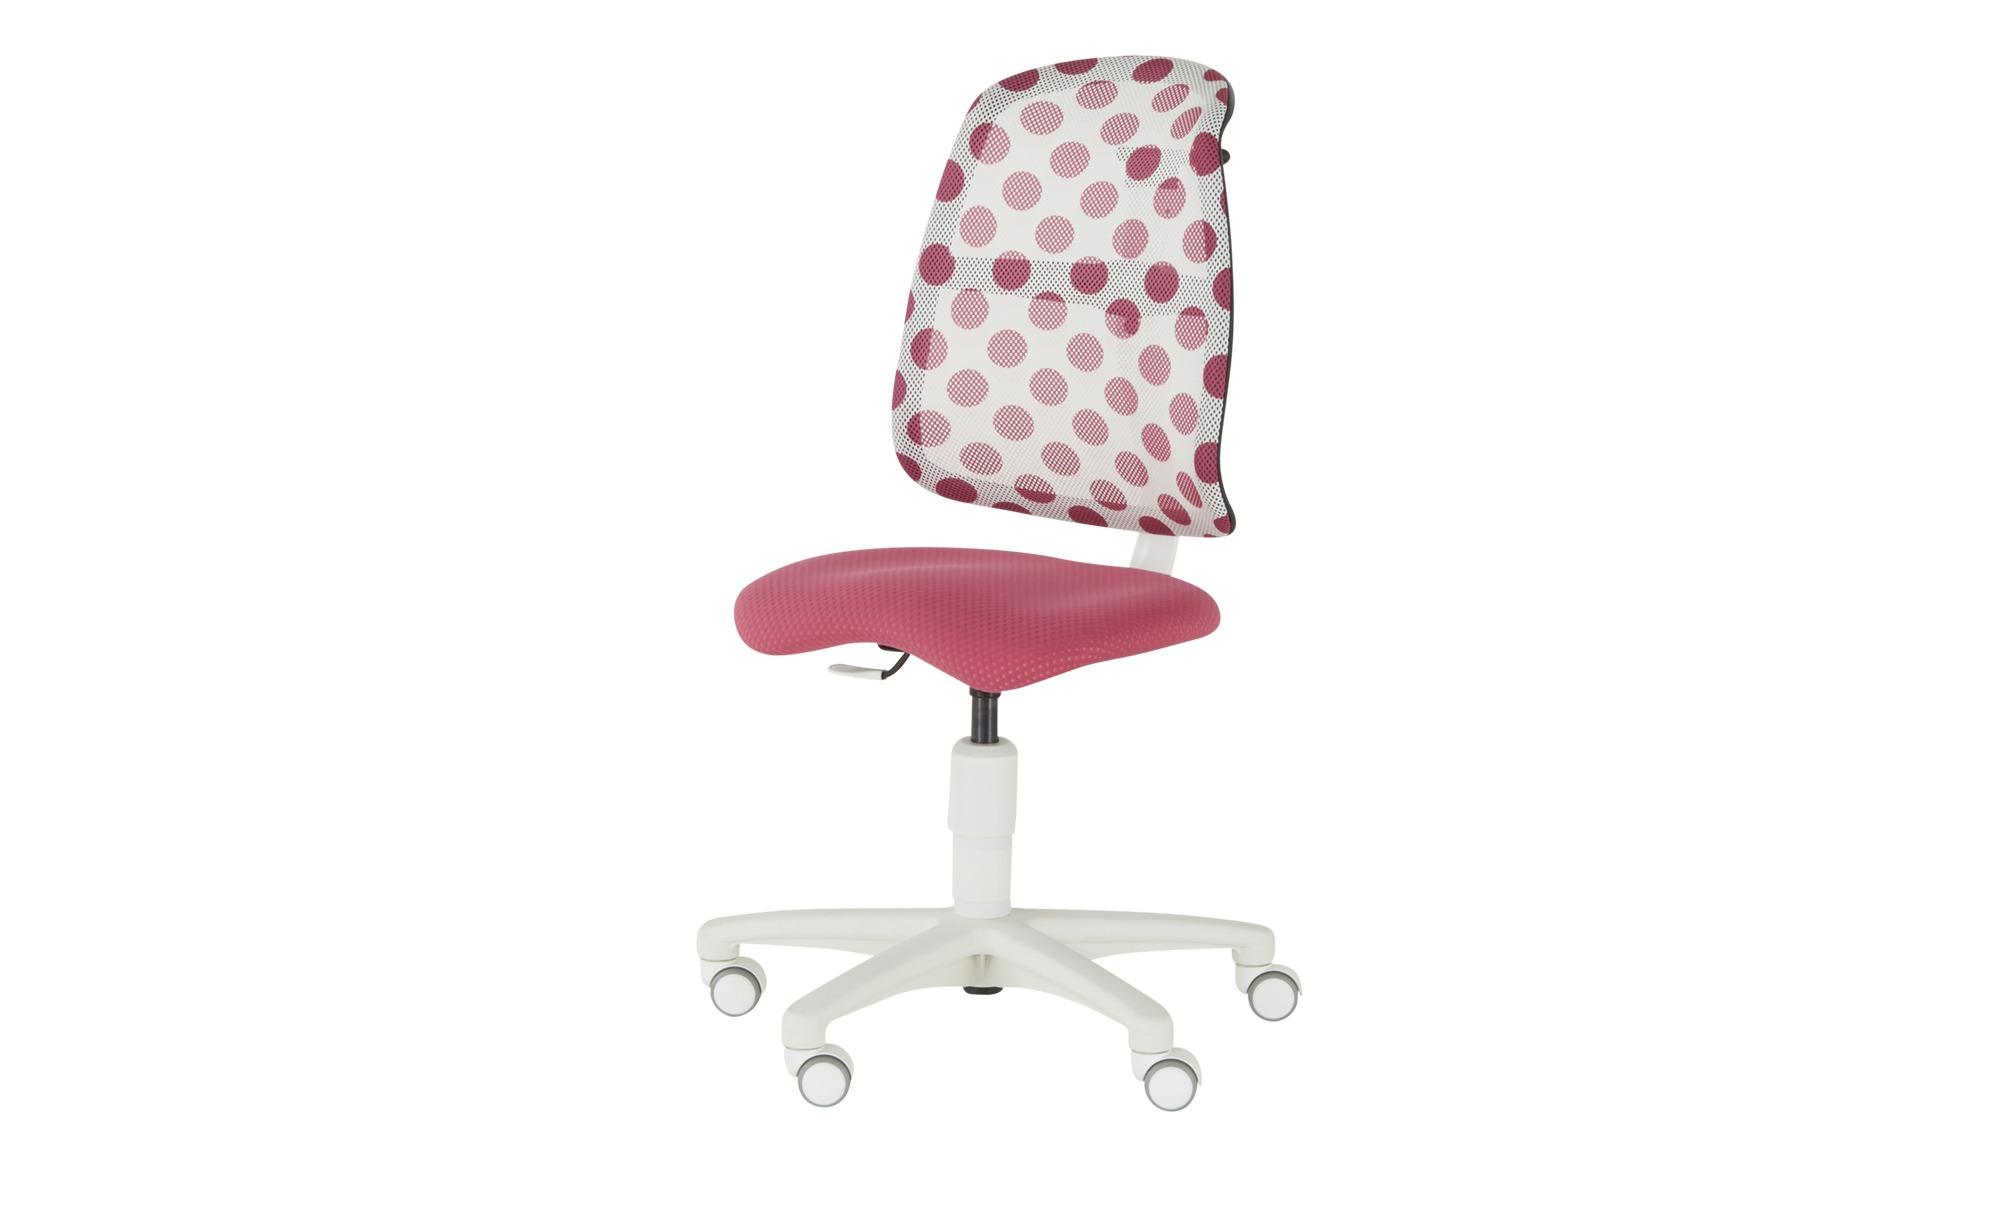 PAIDI Kinder- und Jugenddrehstuhl  Sino ¦ rosa/pink Stühle > Bürostühle > Drehstühle - Höffner | Kinderzimmer > Kinderzimmerstühle | Möbel Höffner DE